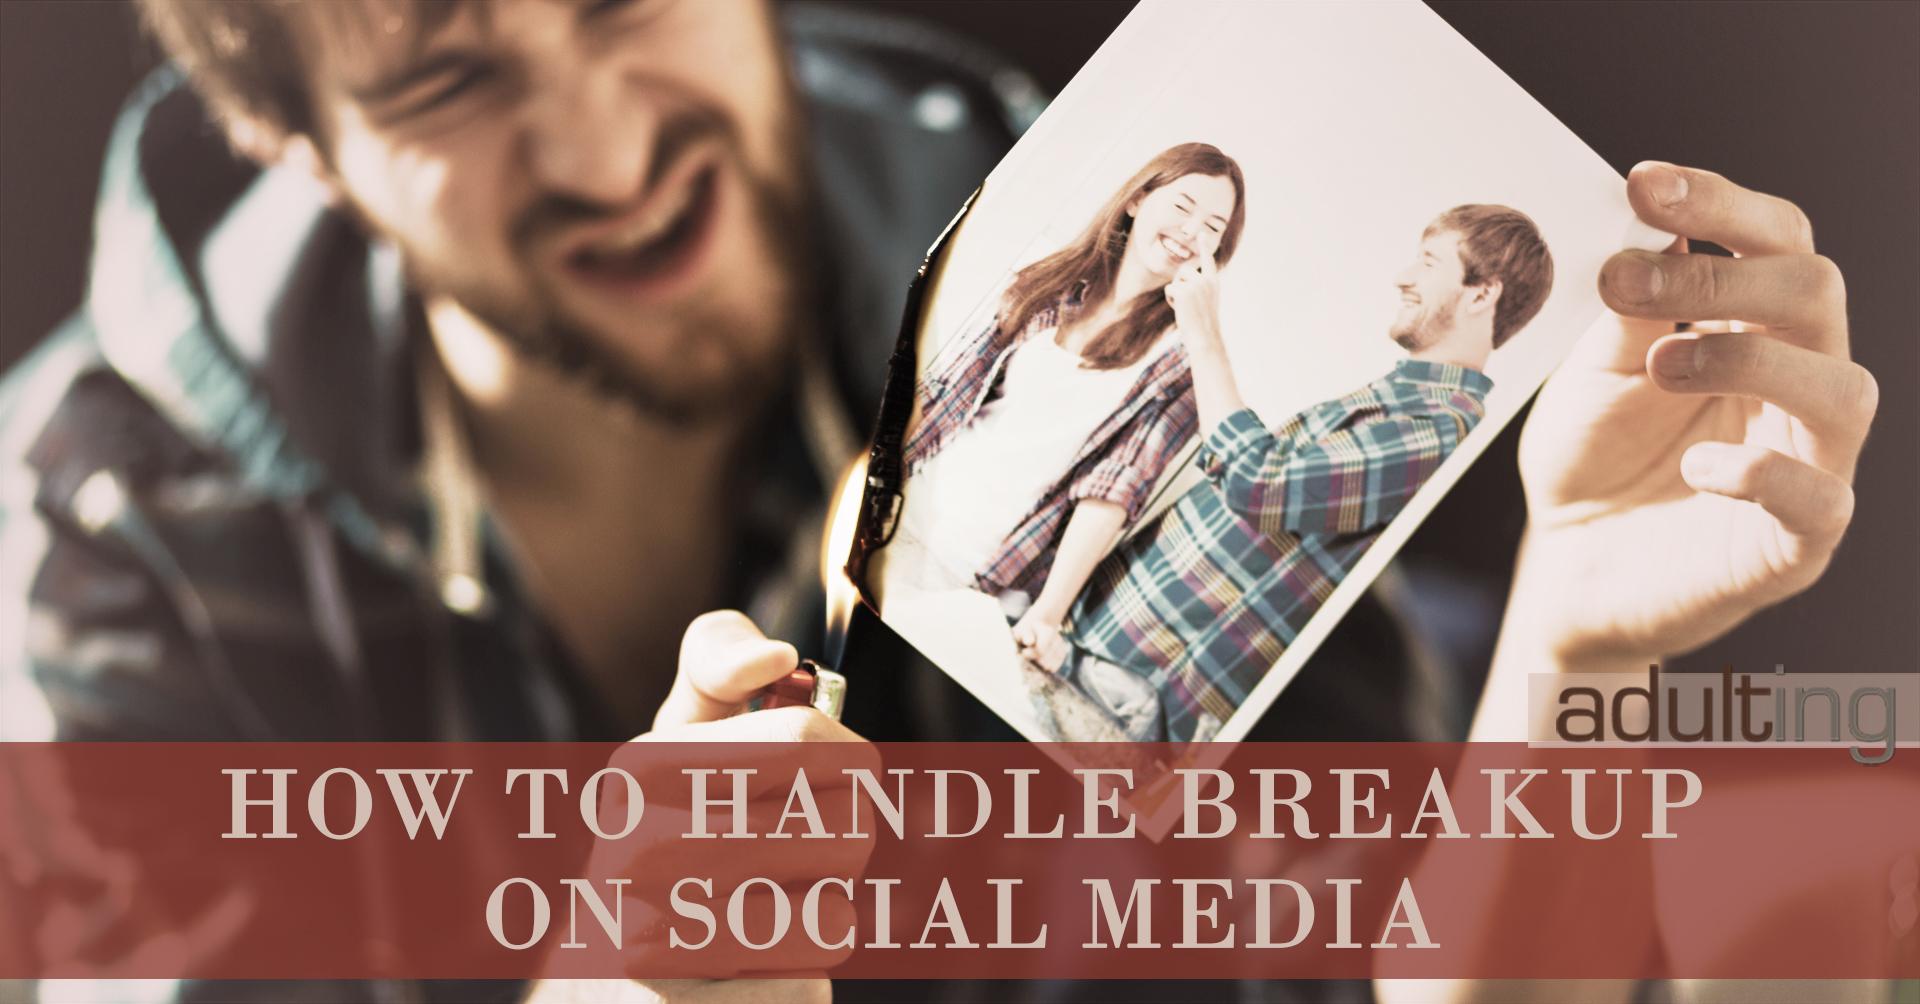 How to Handle Breakup on Social Media